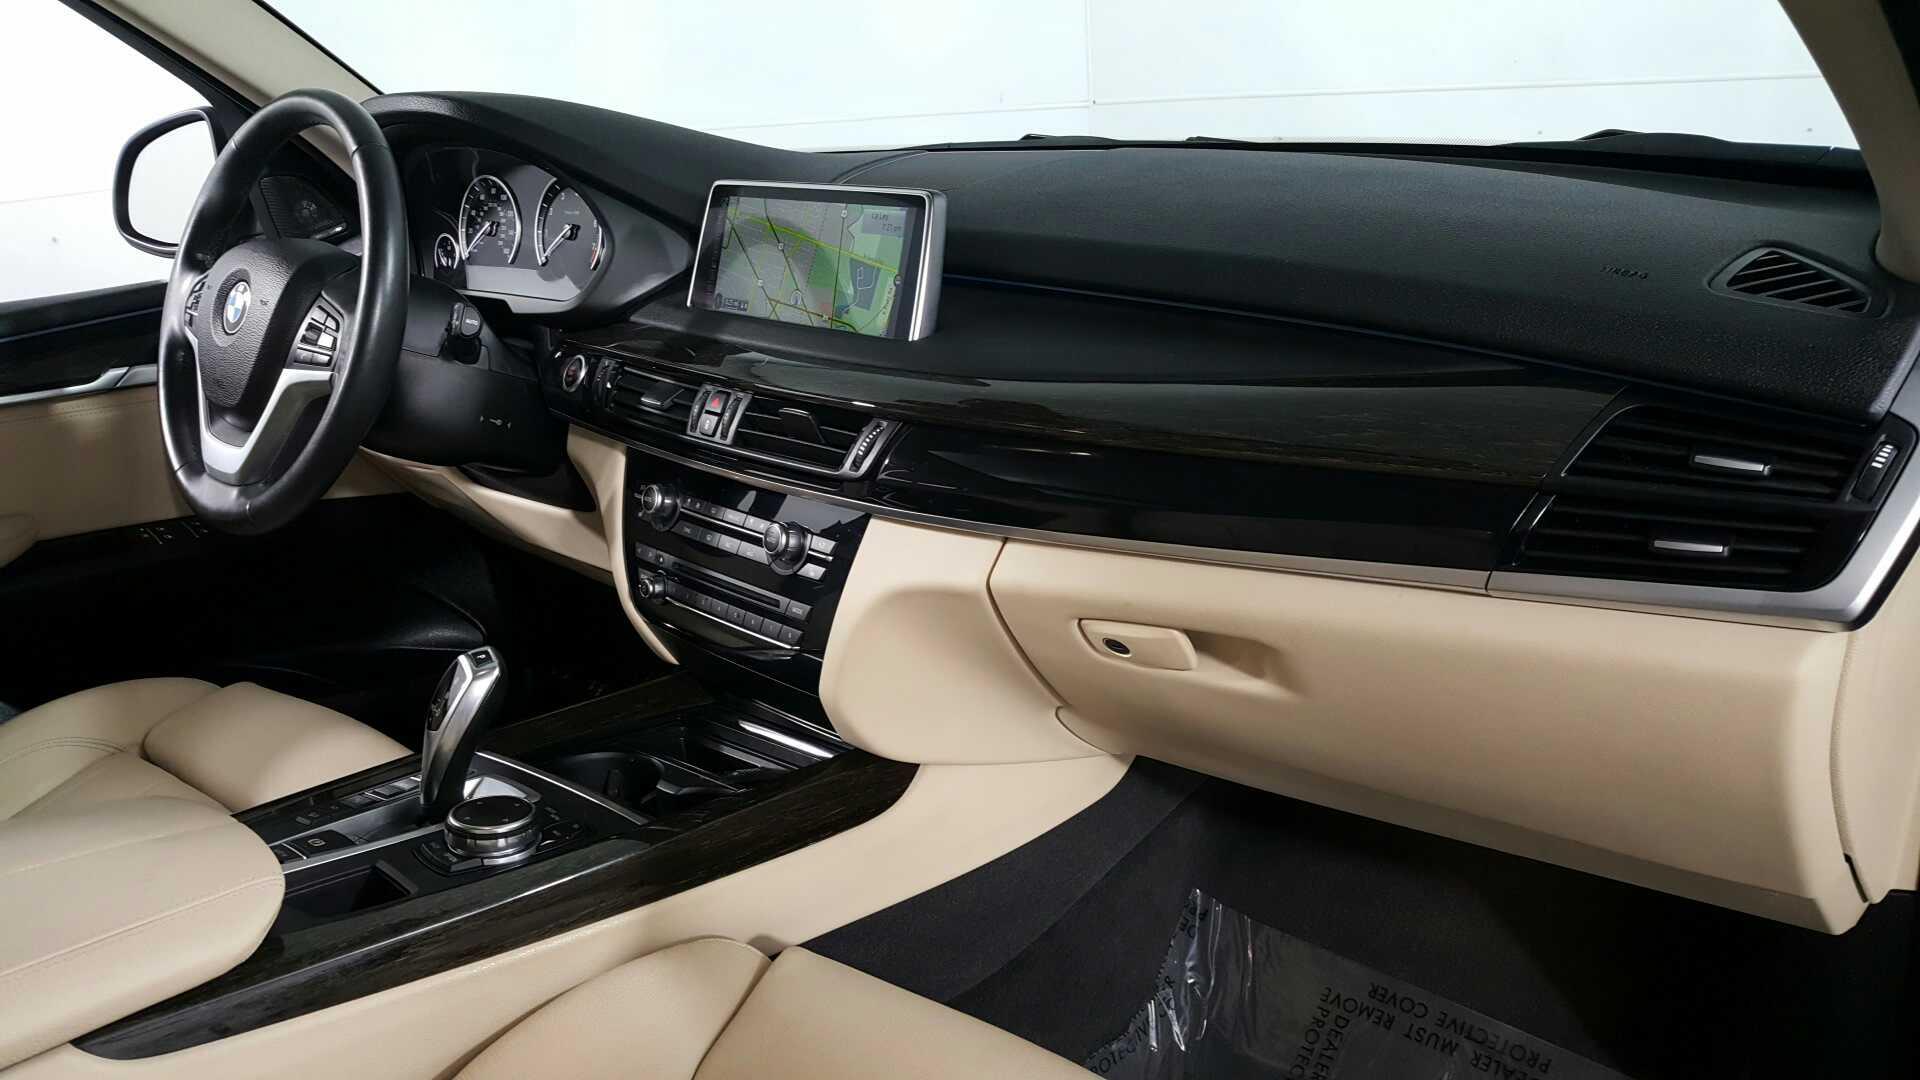 2016 BMW X5 xDrive35i 3rd Row Seat